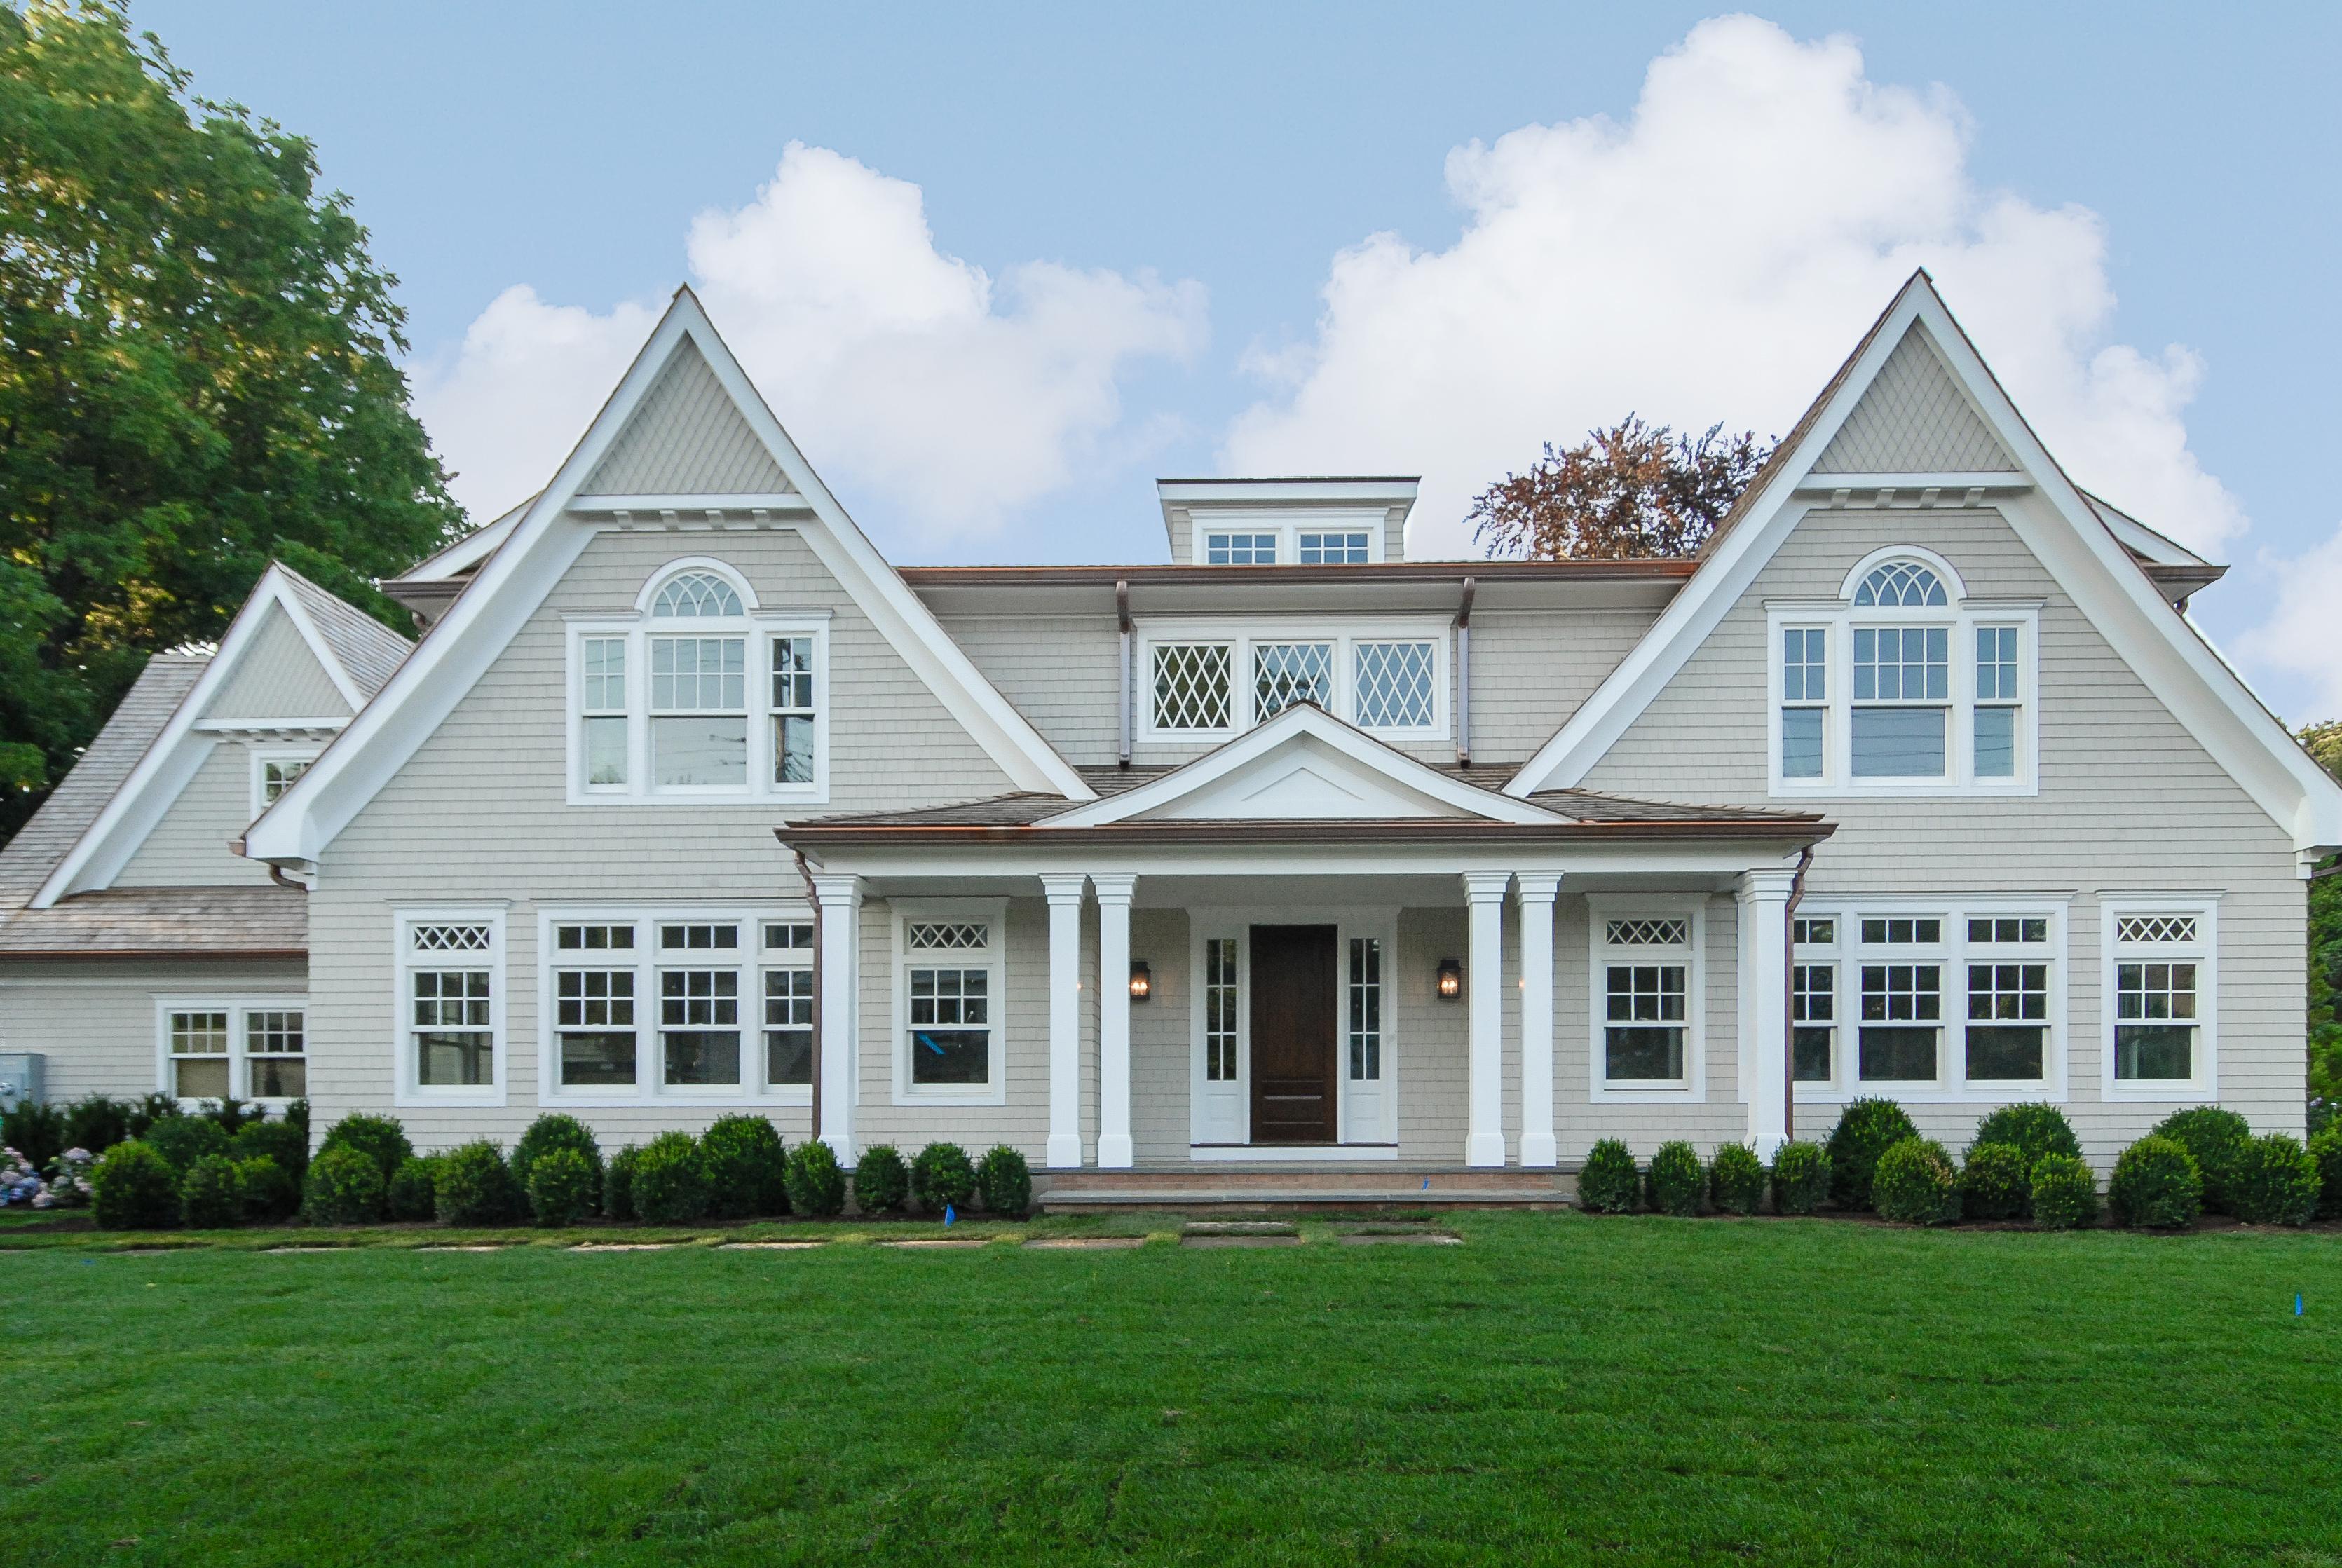 独户住宅 为 销售 在 Magnificent Colonial 131 Apawamis Avenue Rye, 纽约州 10580 美国